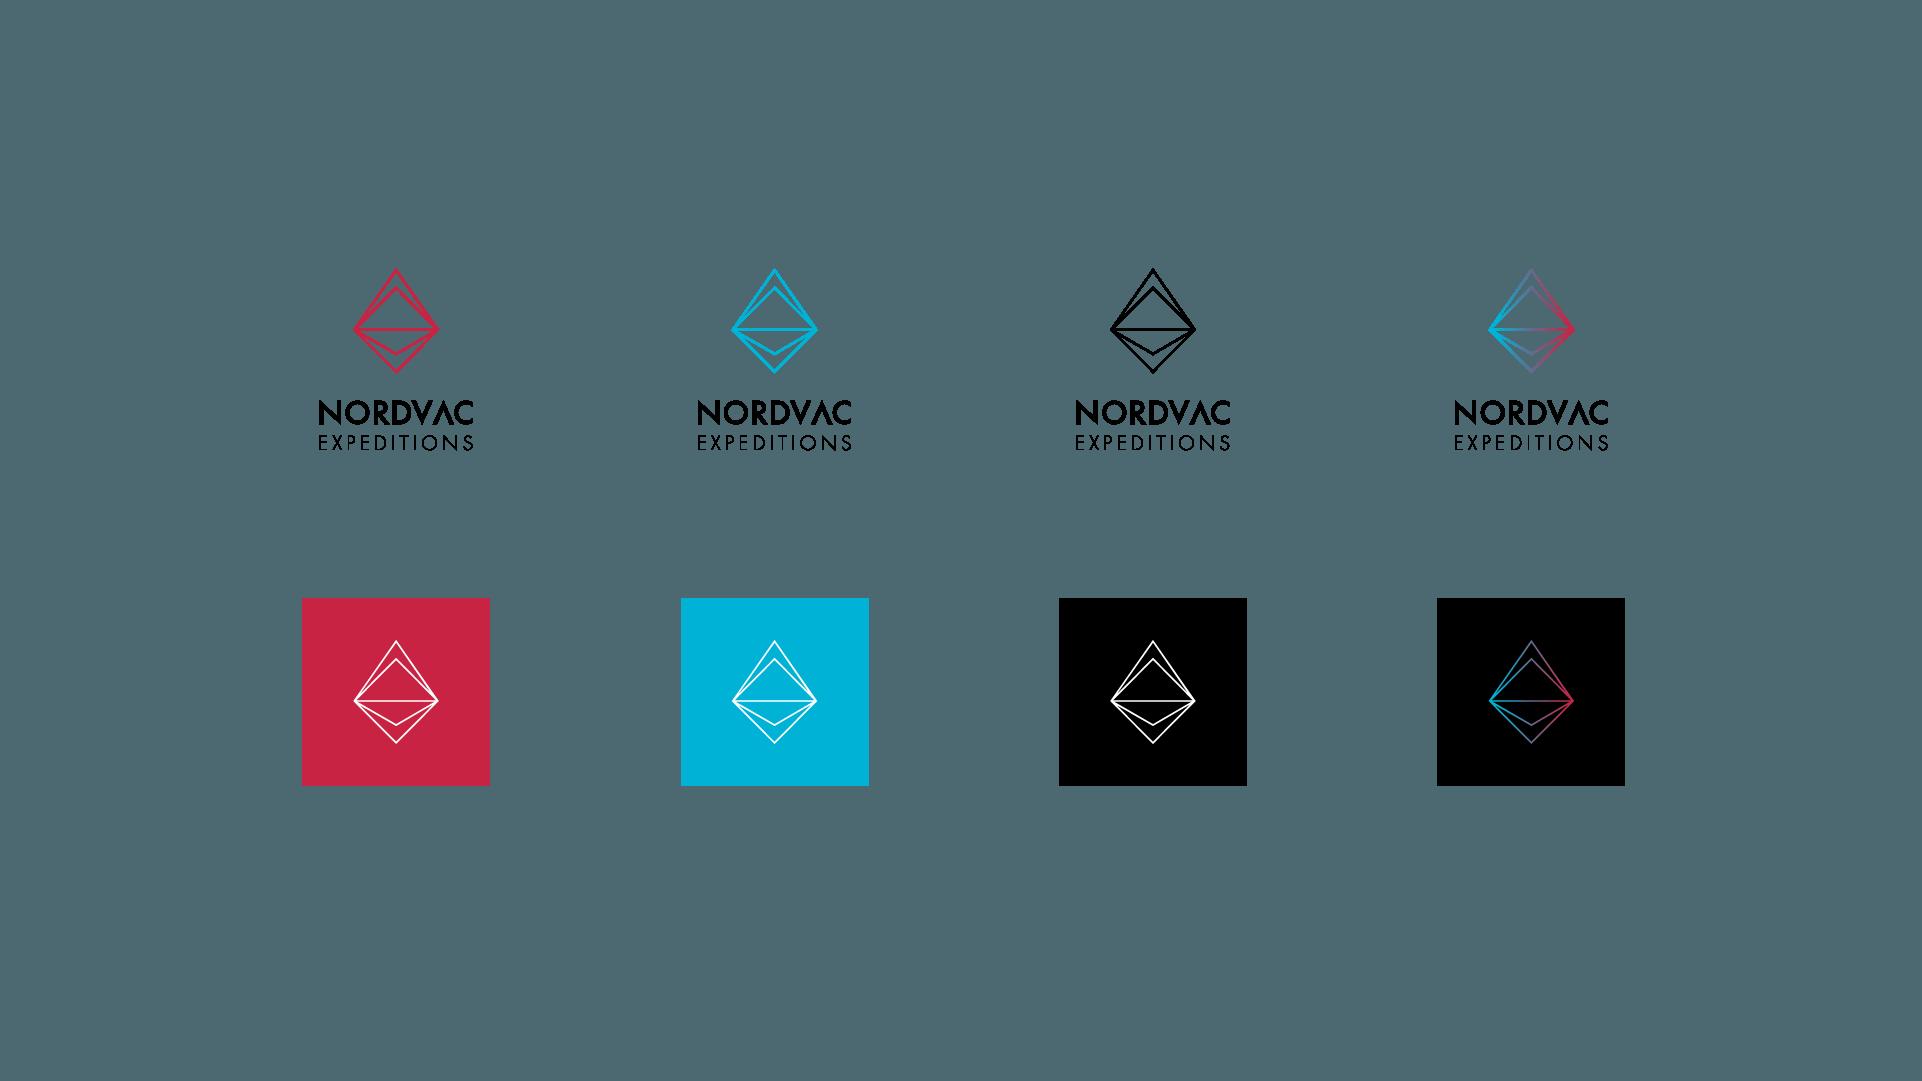 nordvac-logo